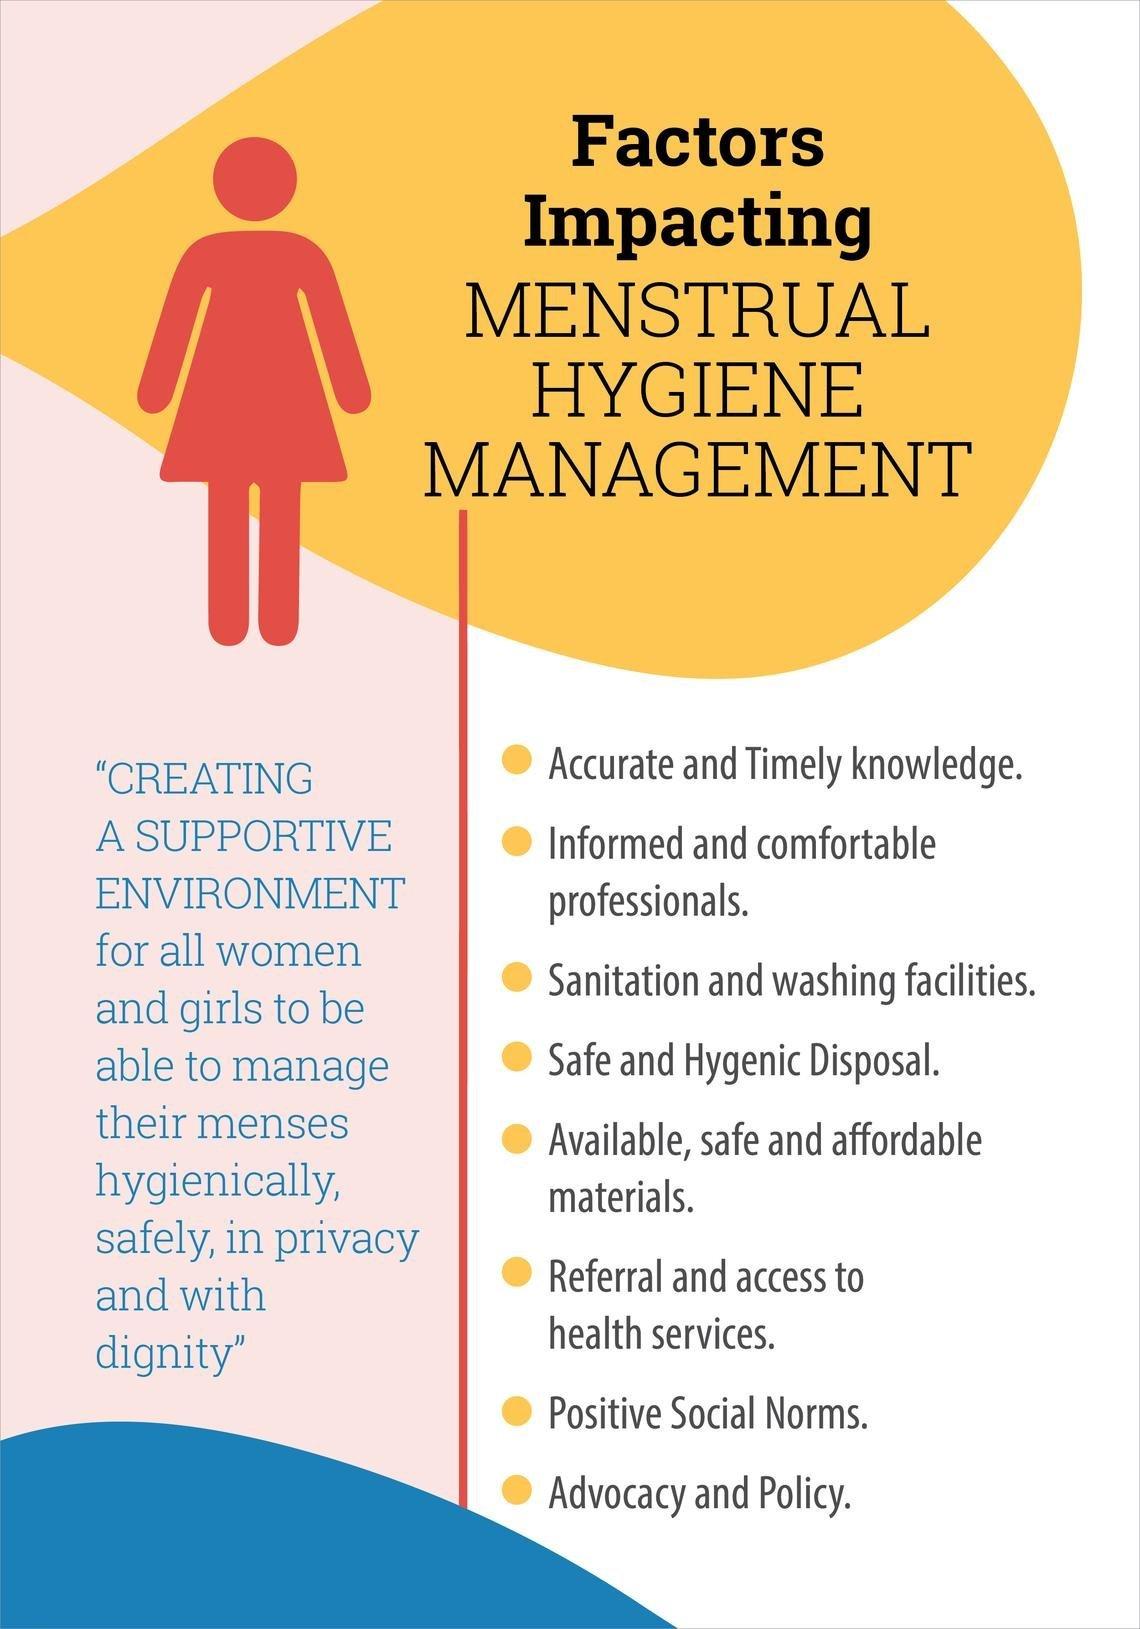 Factors Impacting Menstrual Hygiene Management